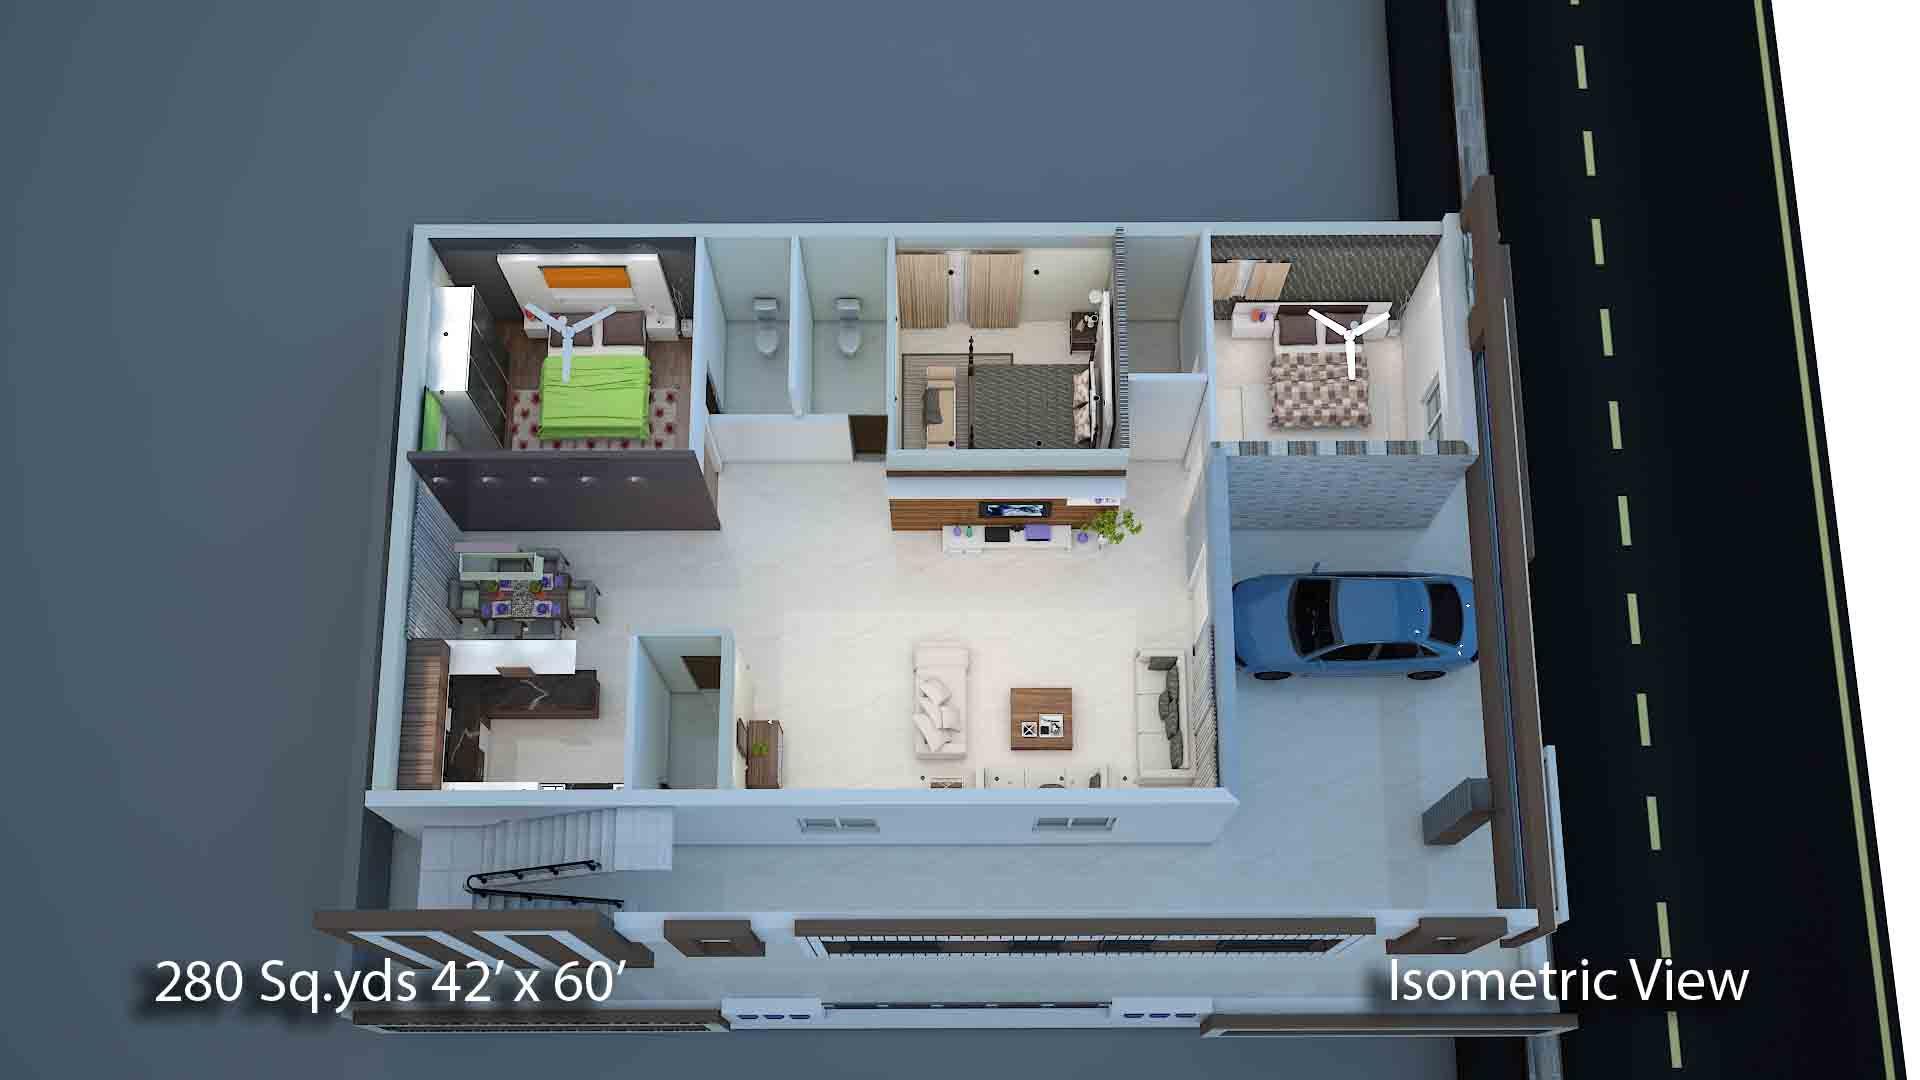 280 Sqyrds 42x60 Sqfts South Facing 2bhk House Plans House Plans Building A House Indian House Plans